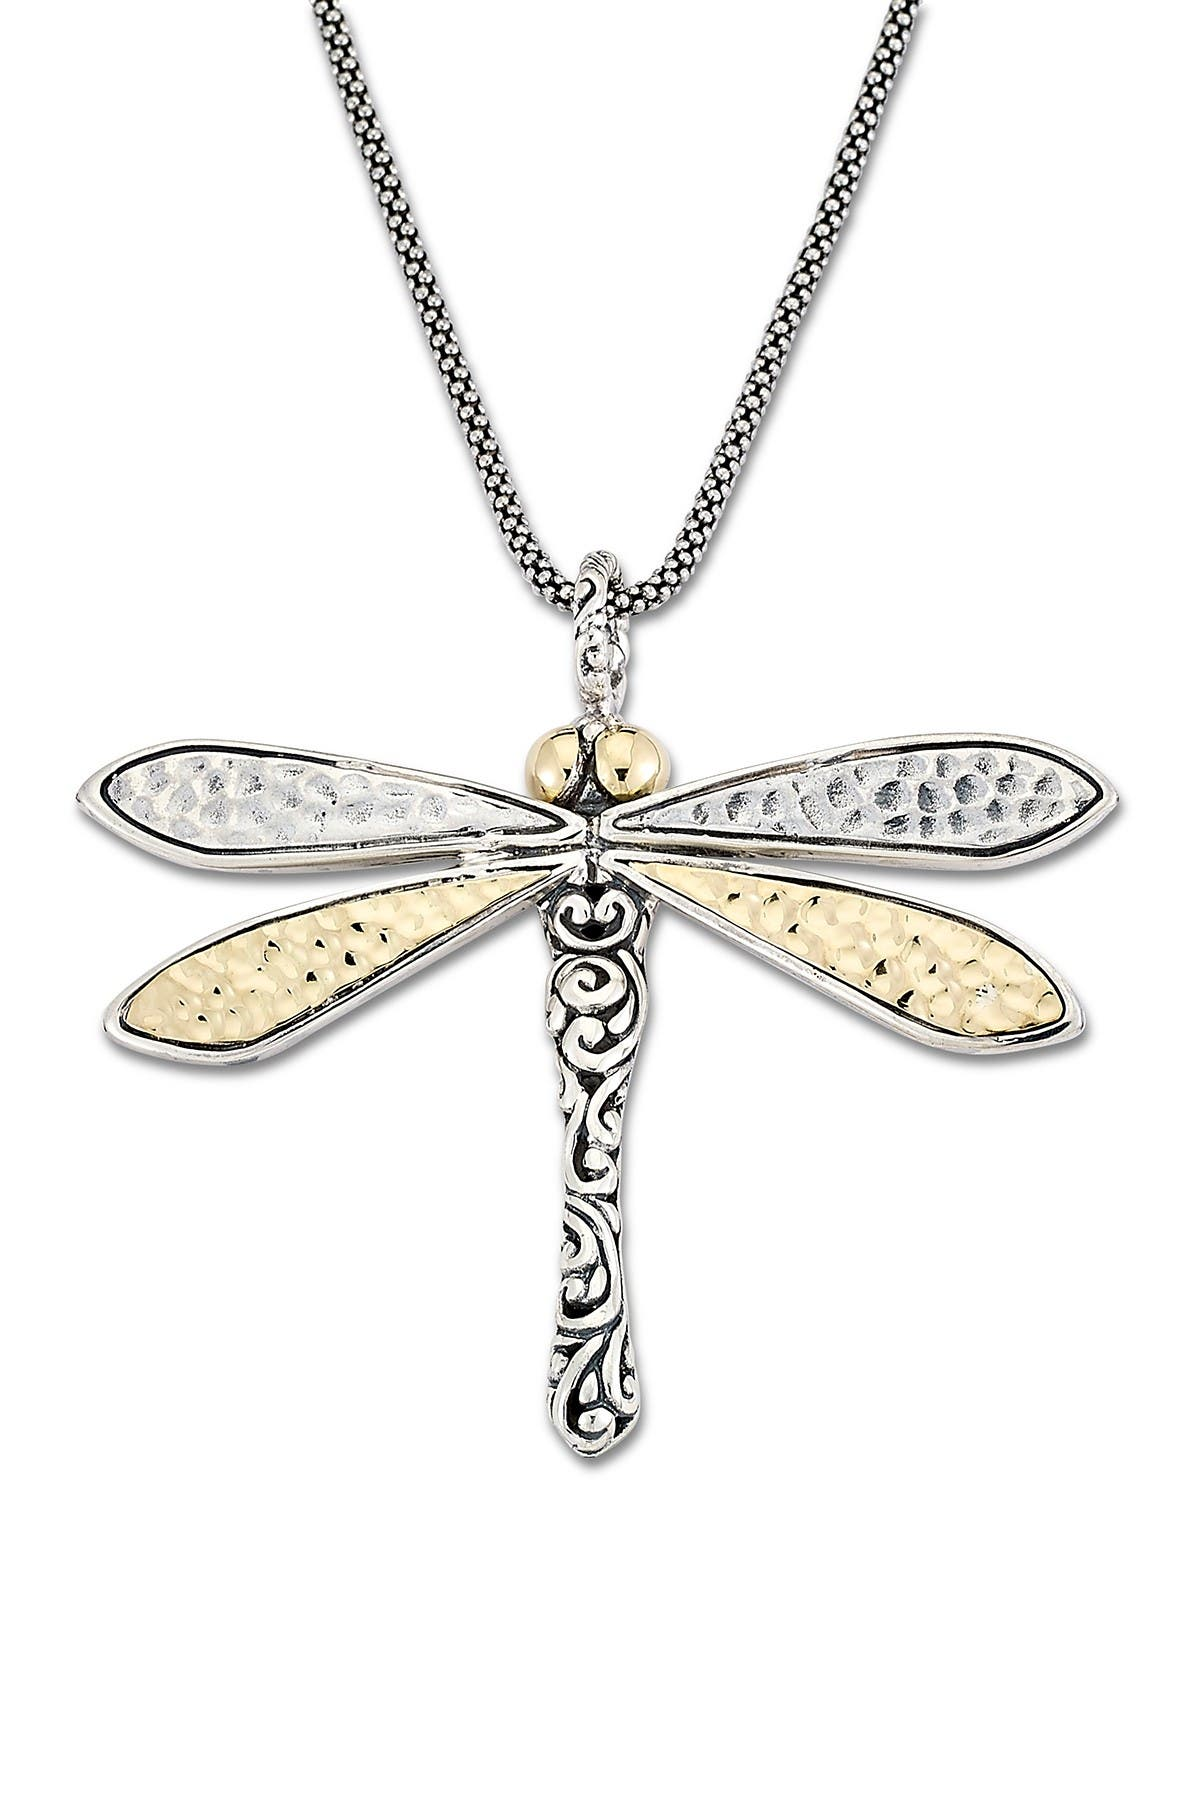 Bonyak Jewelry 18 Inch Hamilton Gold Plated Necklace w// 6mm Jet Birth Month Stone Beads and Saint Sebastian//Golf